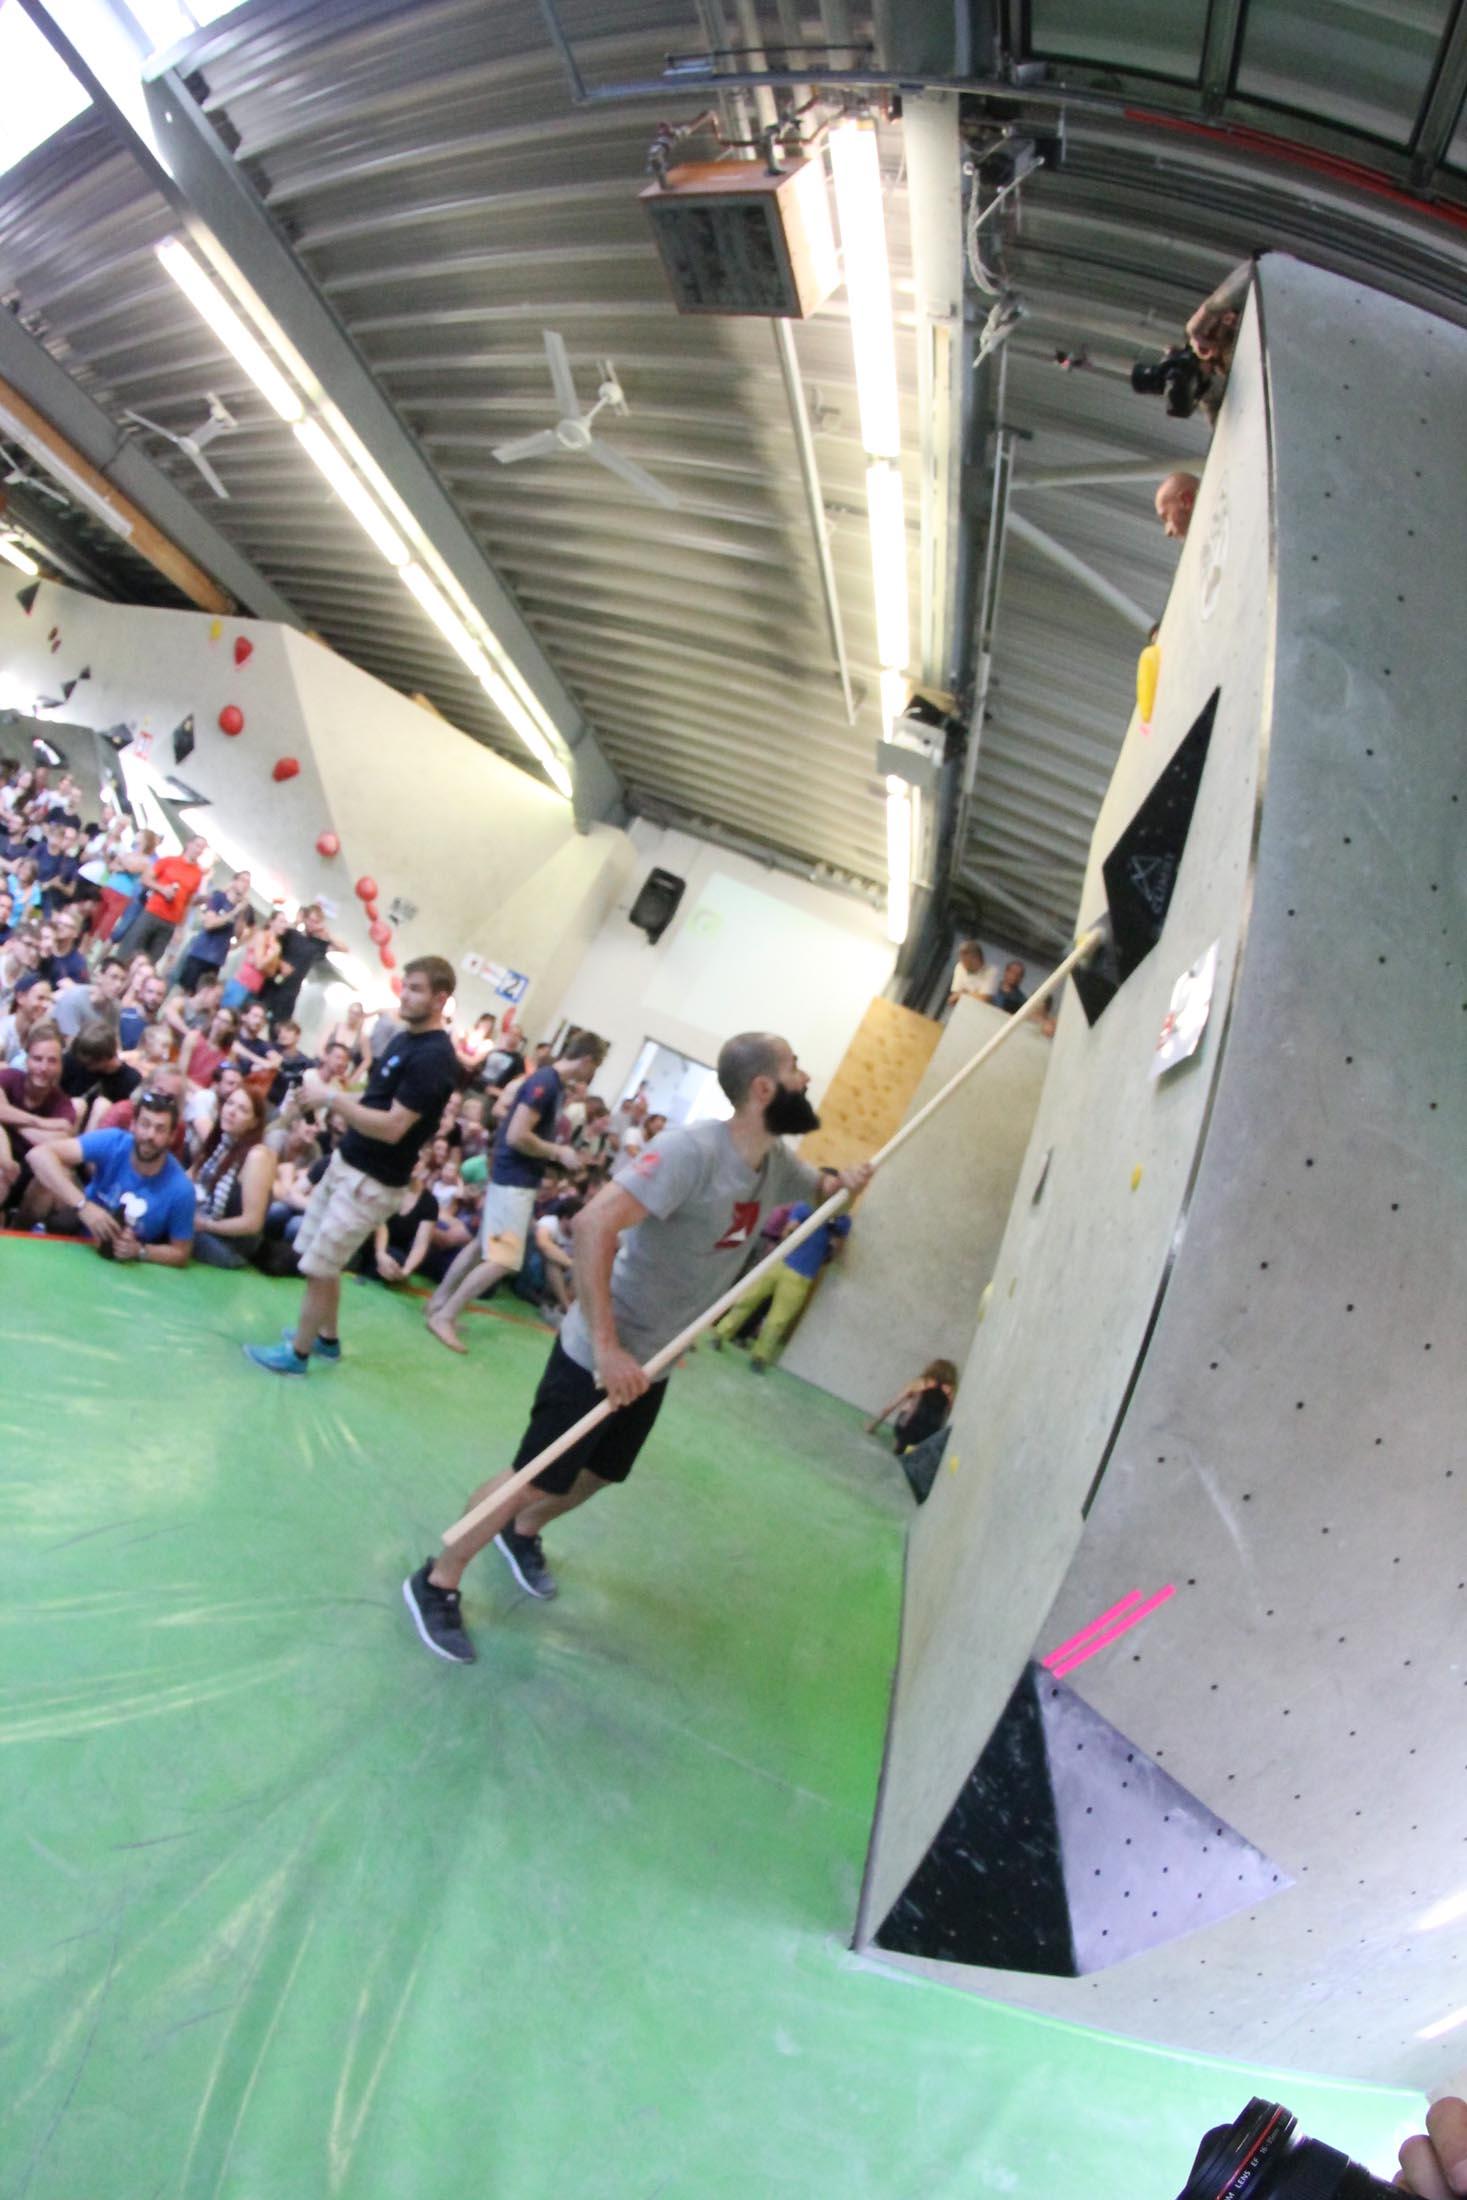 Finale, internationaler bouldercup Frankenjura 2016, BLOCKHELDEN Erlangen, Mammut, Bergfreunde.de, Boulderwettkampf07092016505